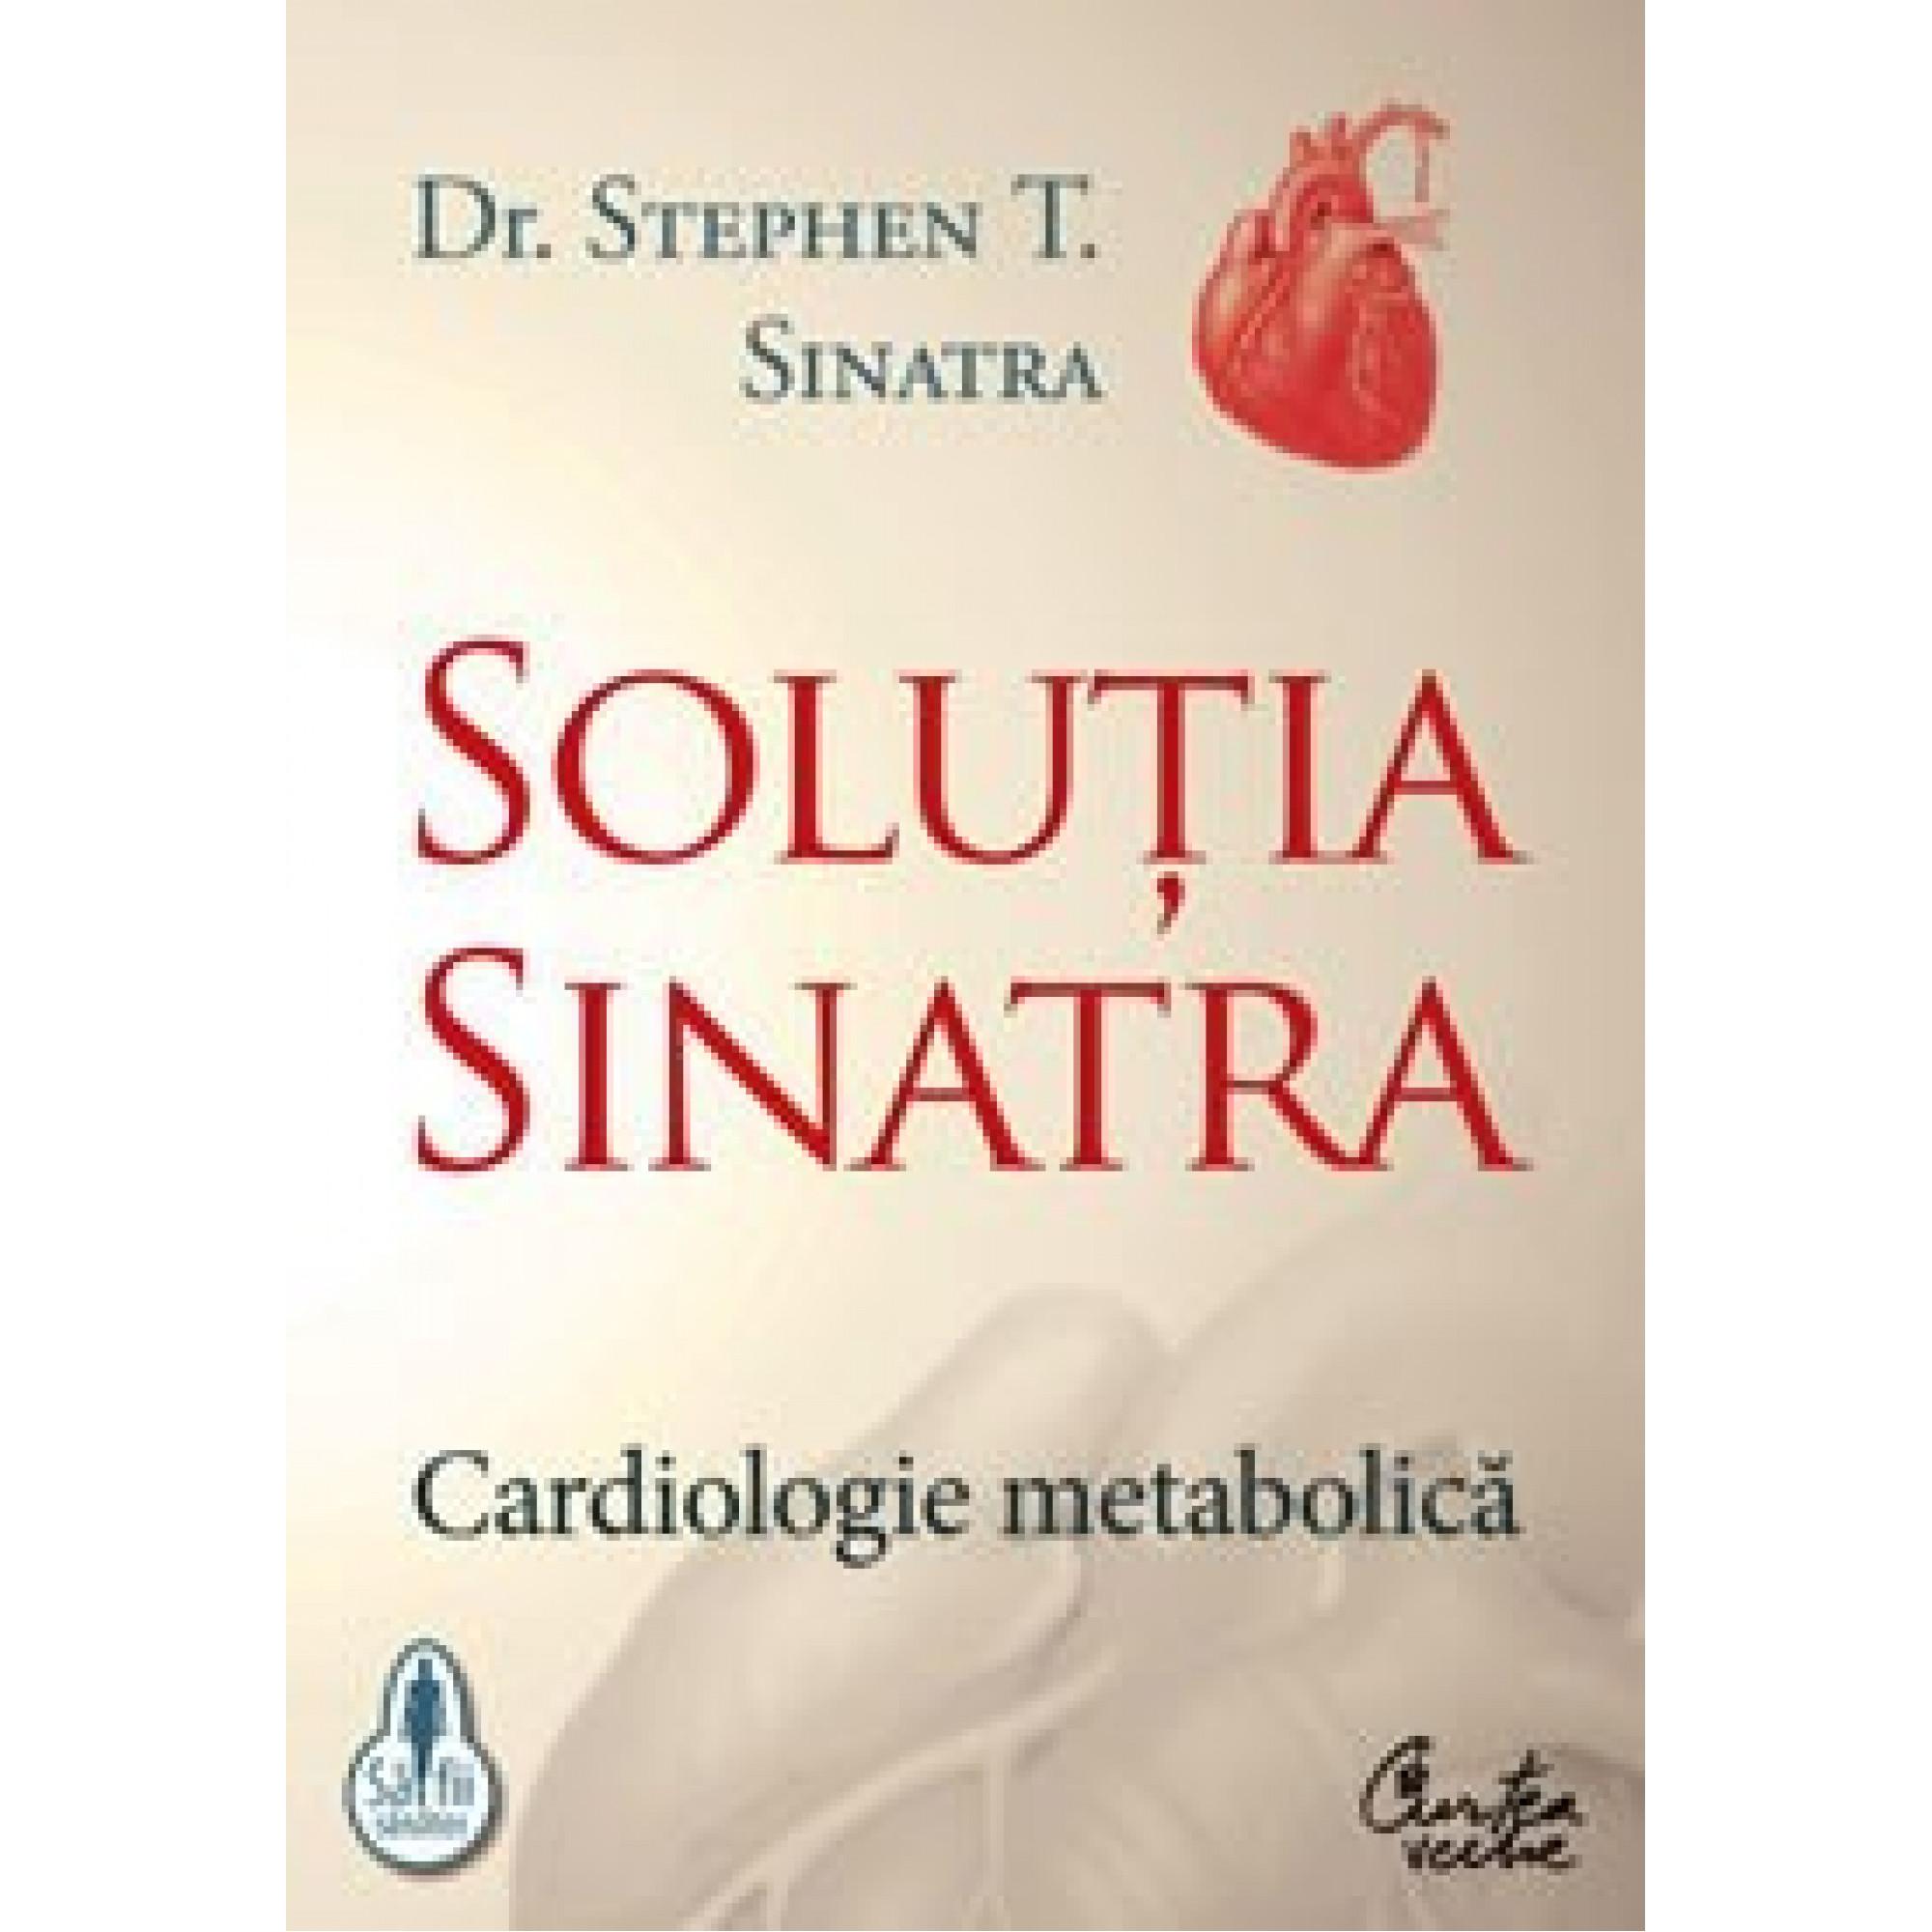 Soluţia Sinatra - Cardiologie metabolică; Dr. Stephen T. Sinatra